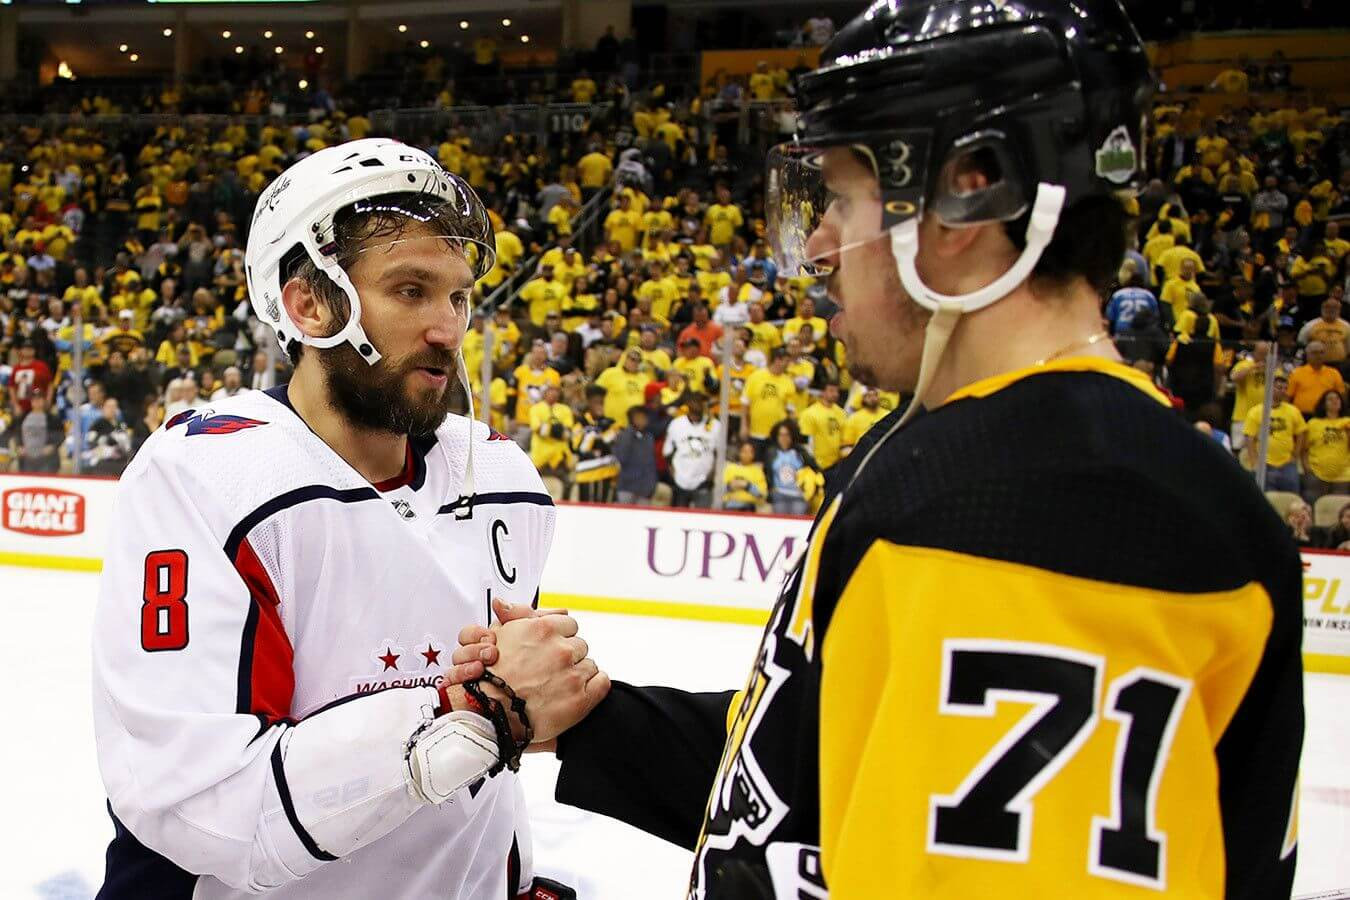 НХЛ. Регулярный чемпионат. Питтсбург — Вашингтон. 14.02.2021 г